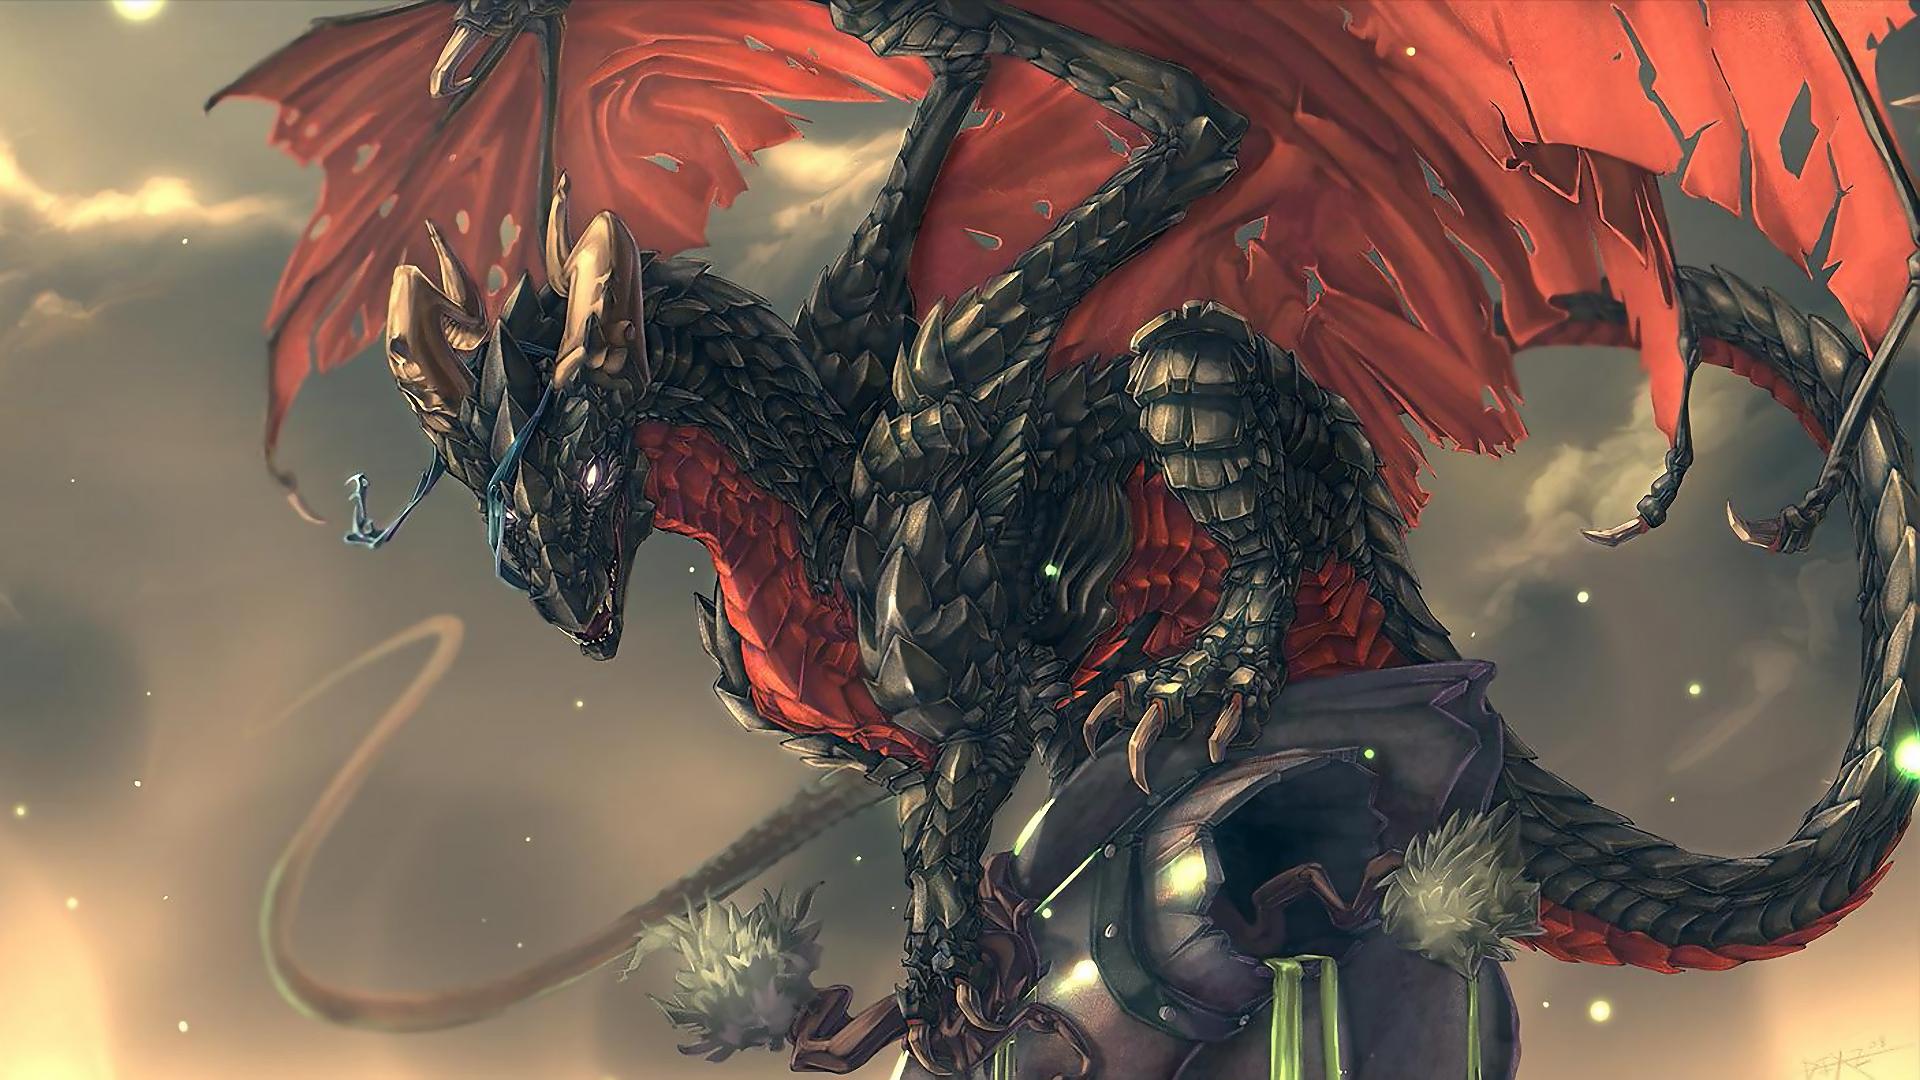 Black Dragon Wallpaper Hd Artistic Joyful